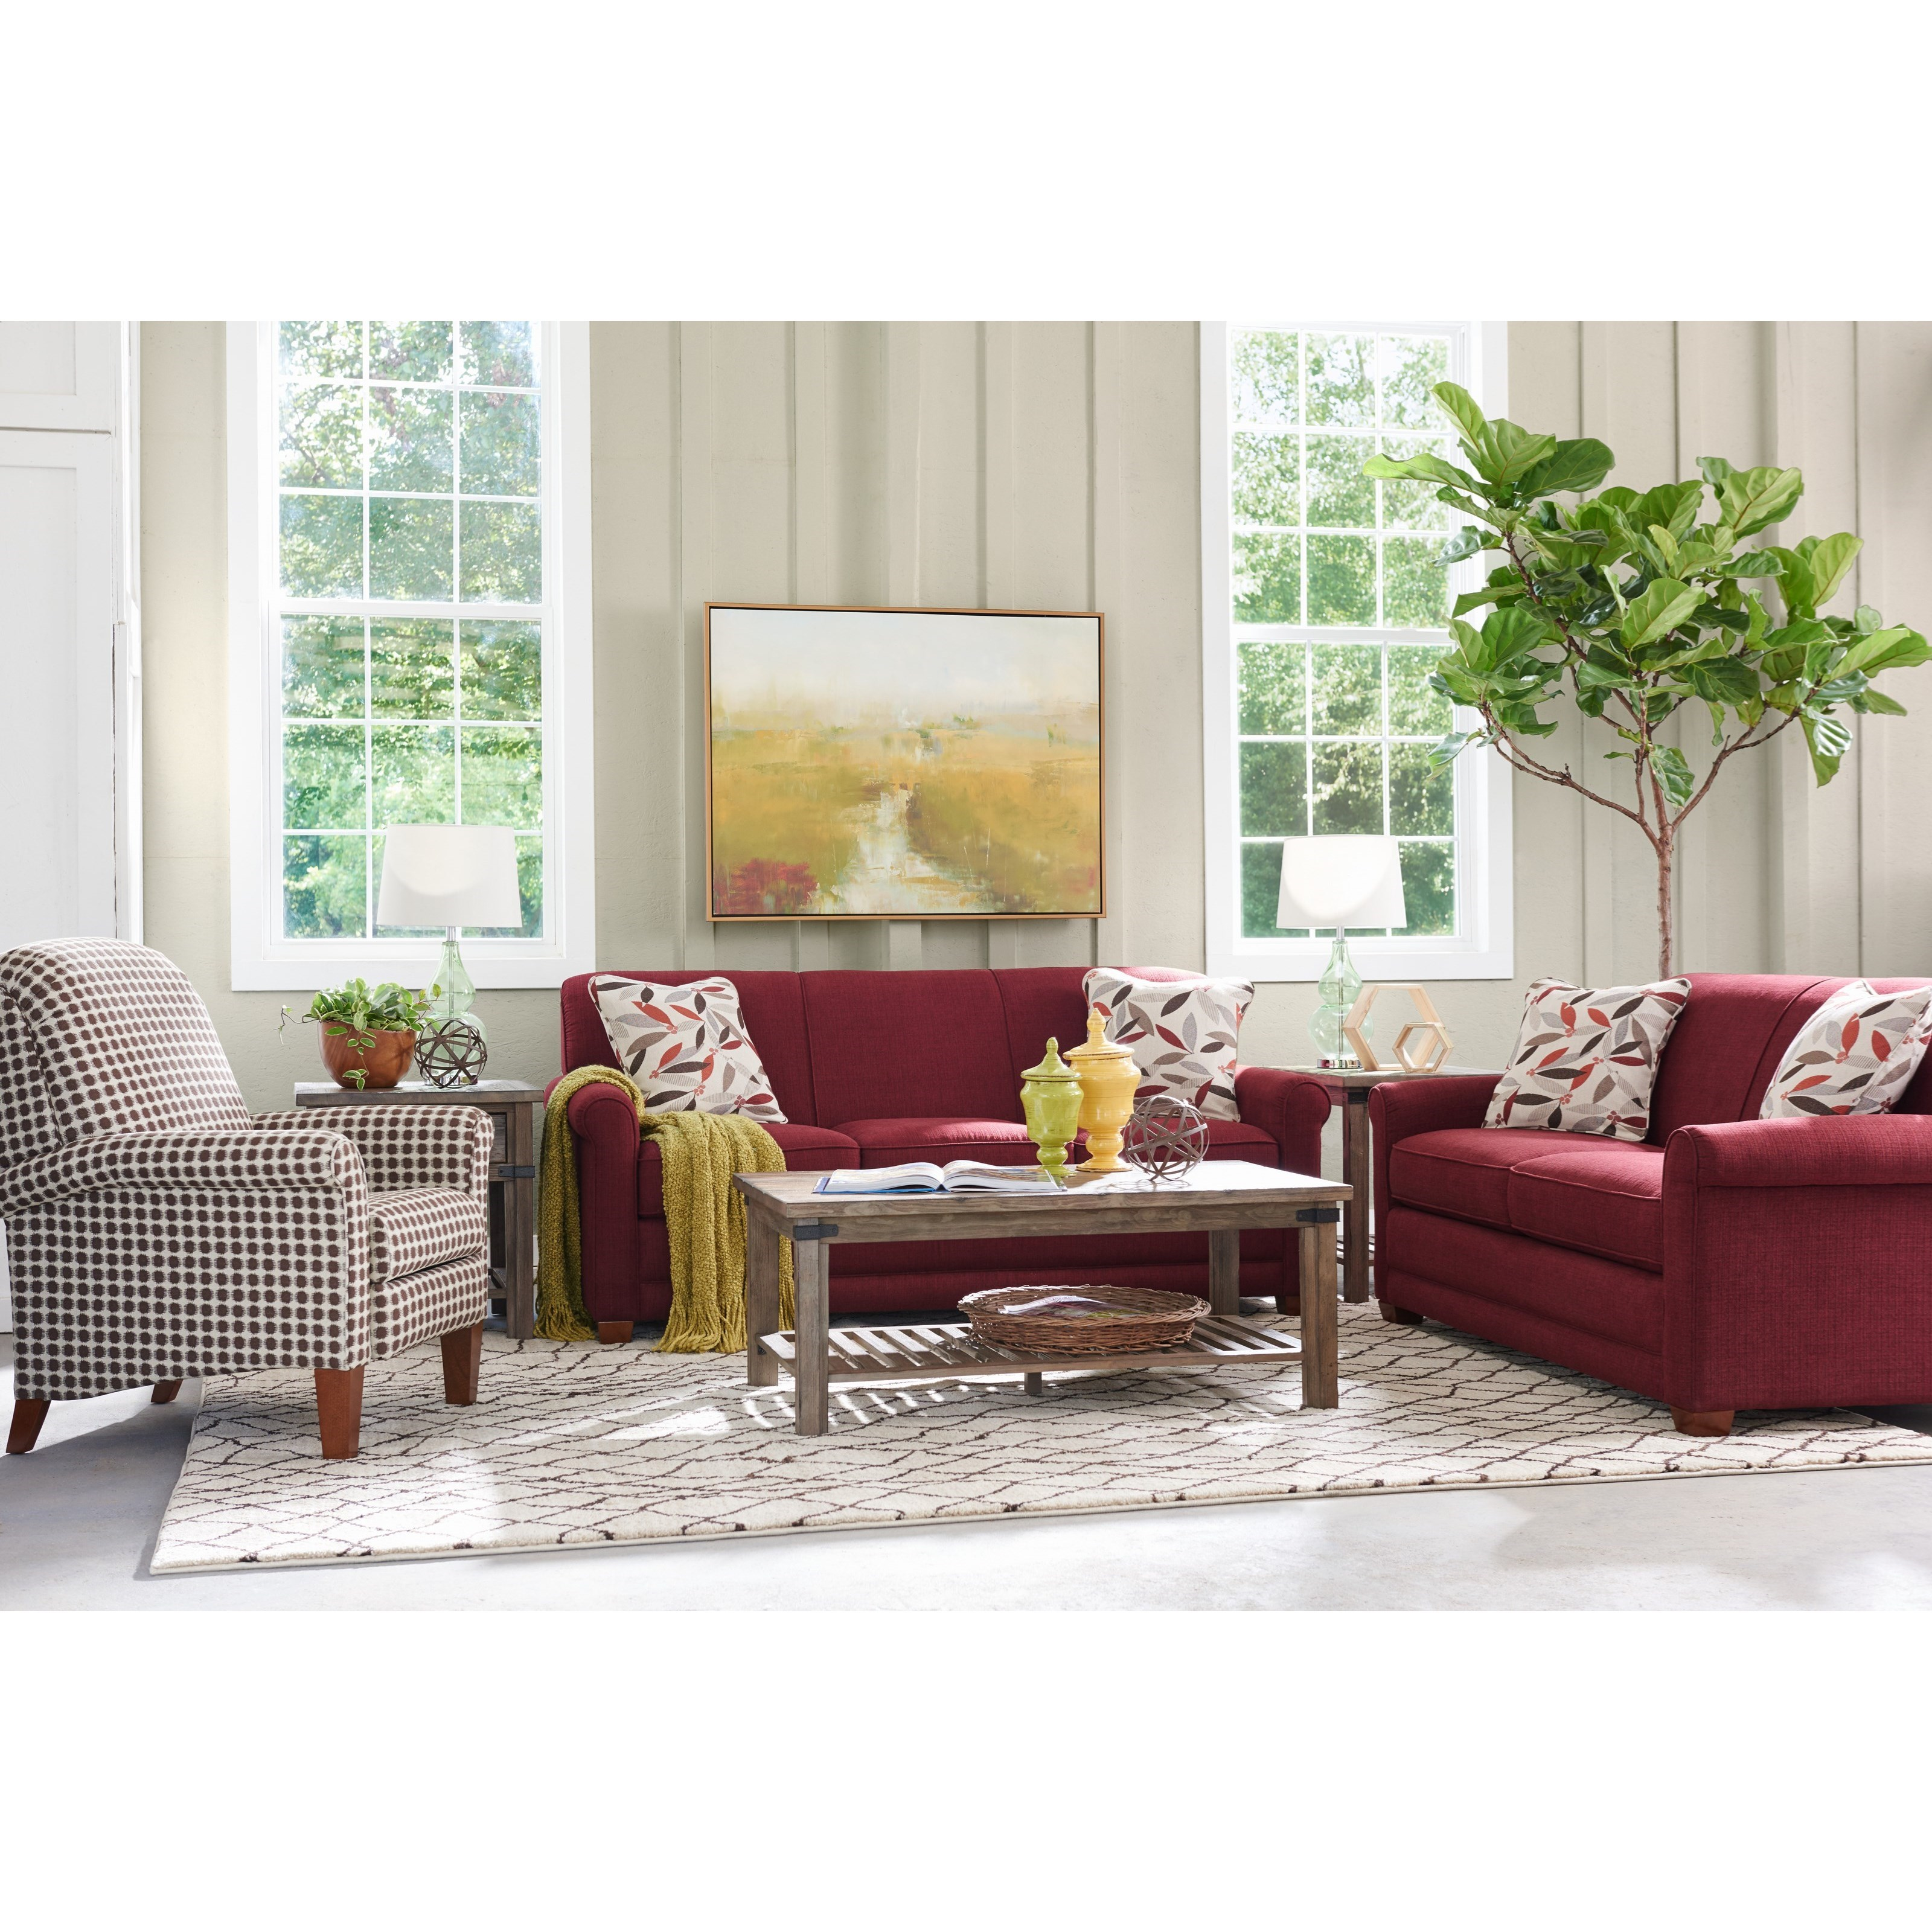 La z boy amanda casual apartment size sofa with premier - Apartment size sectional couch ...